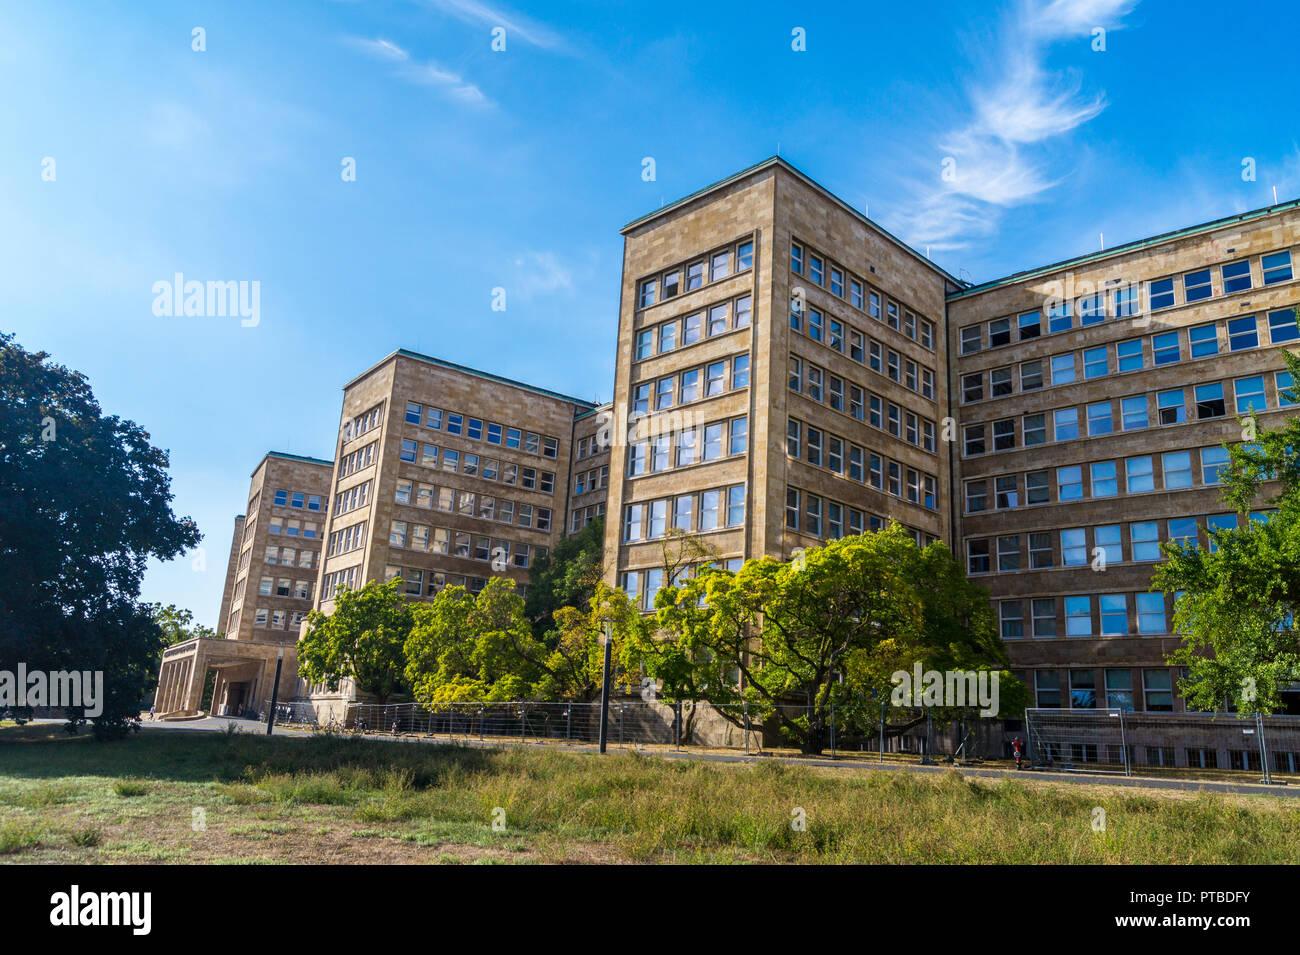 IG-Farben-Haus, by Hans Poelzig, 1928-30, New Objectivity architectural style, now Goethe University campus, Frankfurt, Hessen, Germany Stock Photo